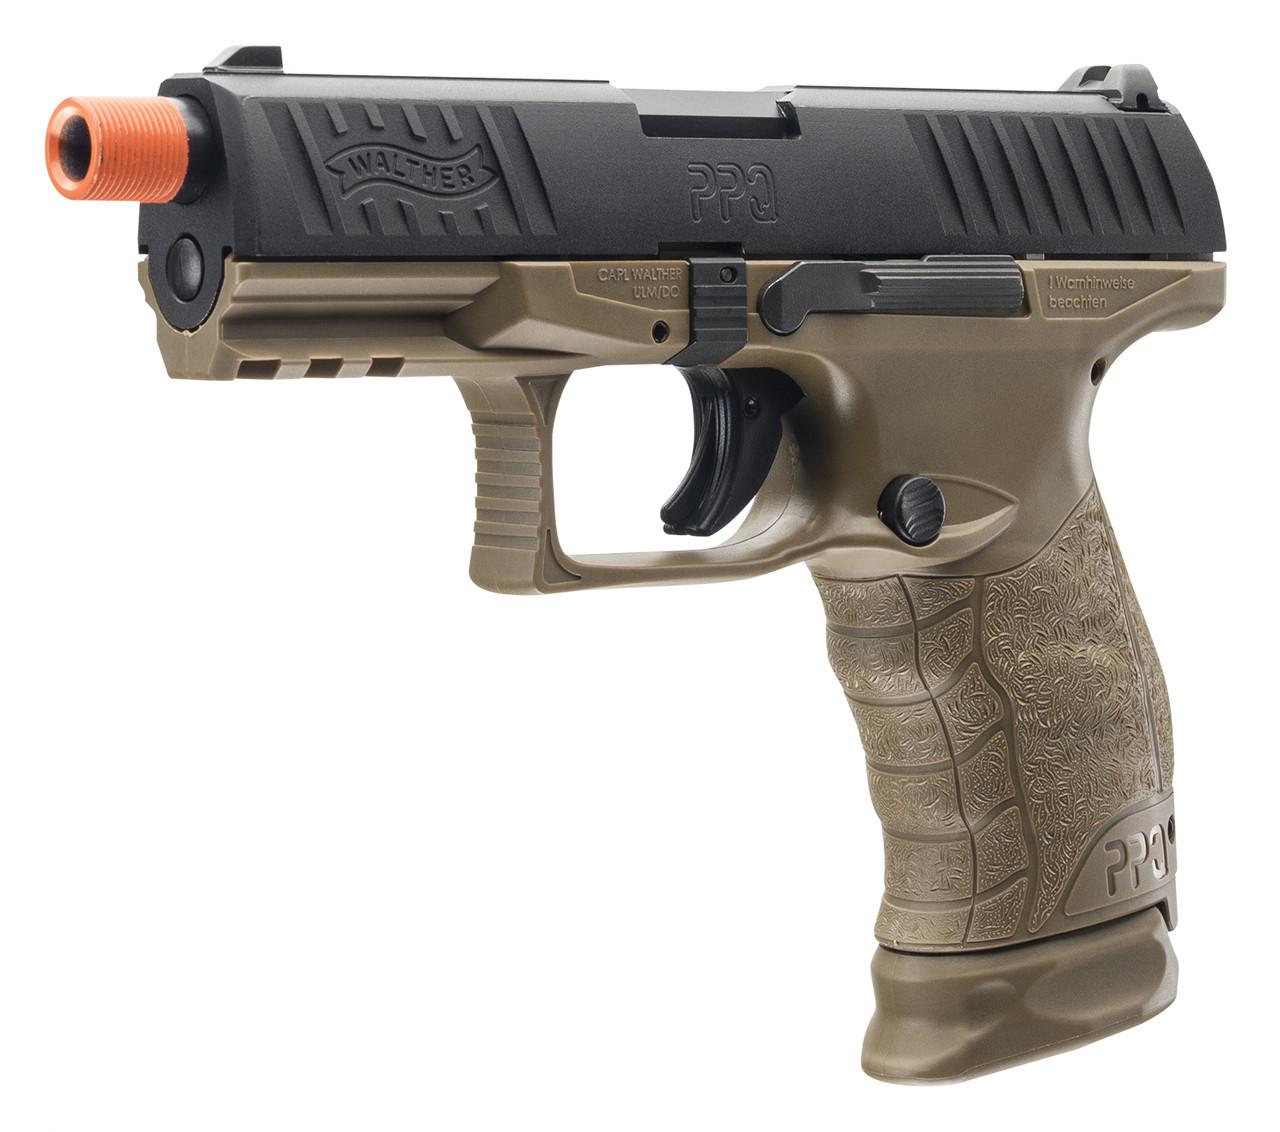 Elite Force Ppq Tactical Gas Blowback Airsoft Pistol Sku Tippmann Model 98 Gun Diagram